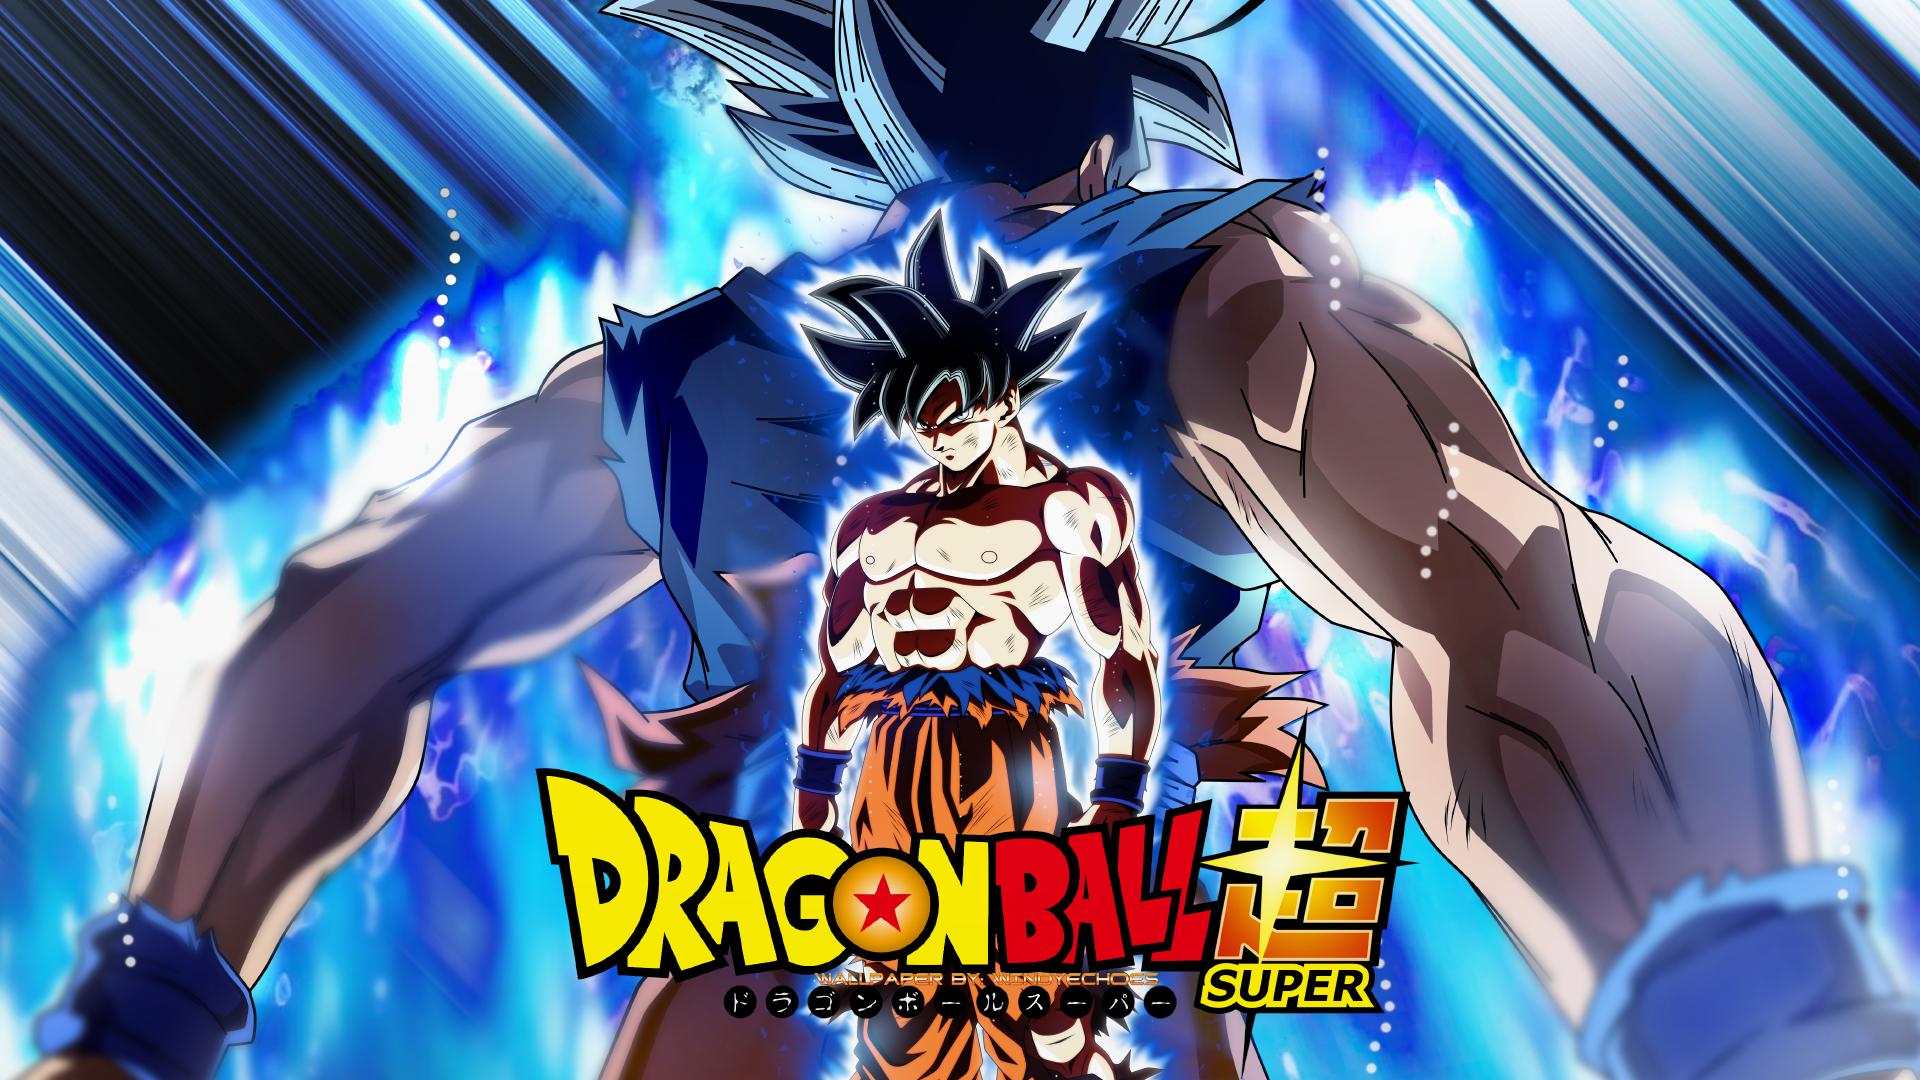 Goku Ultra Hd Wallpaper Background Image 1920x1080 Id